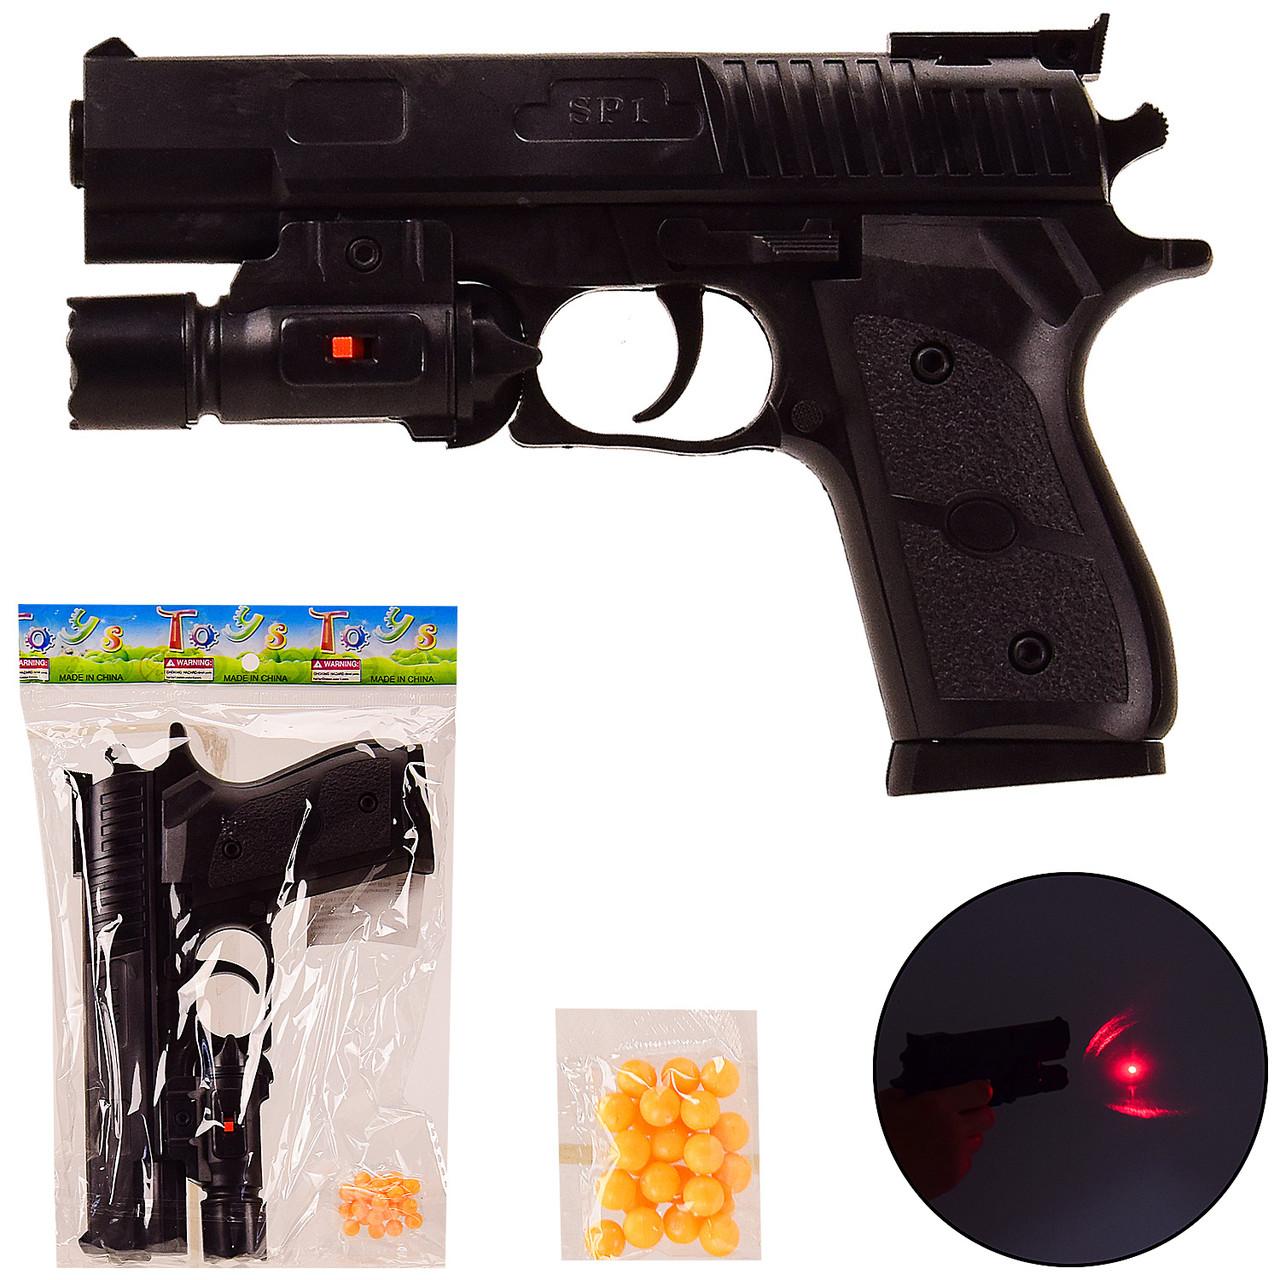 Пистолет SP1-E+  пульки,лазер детский пистолет с лазером на пульках